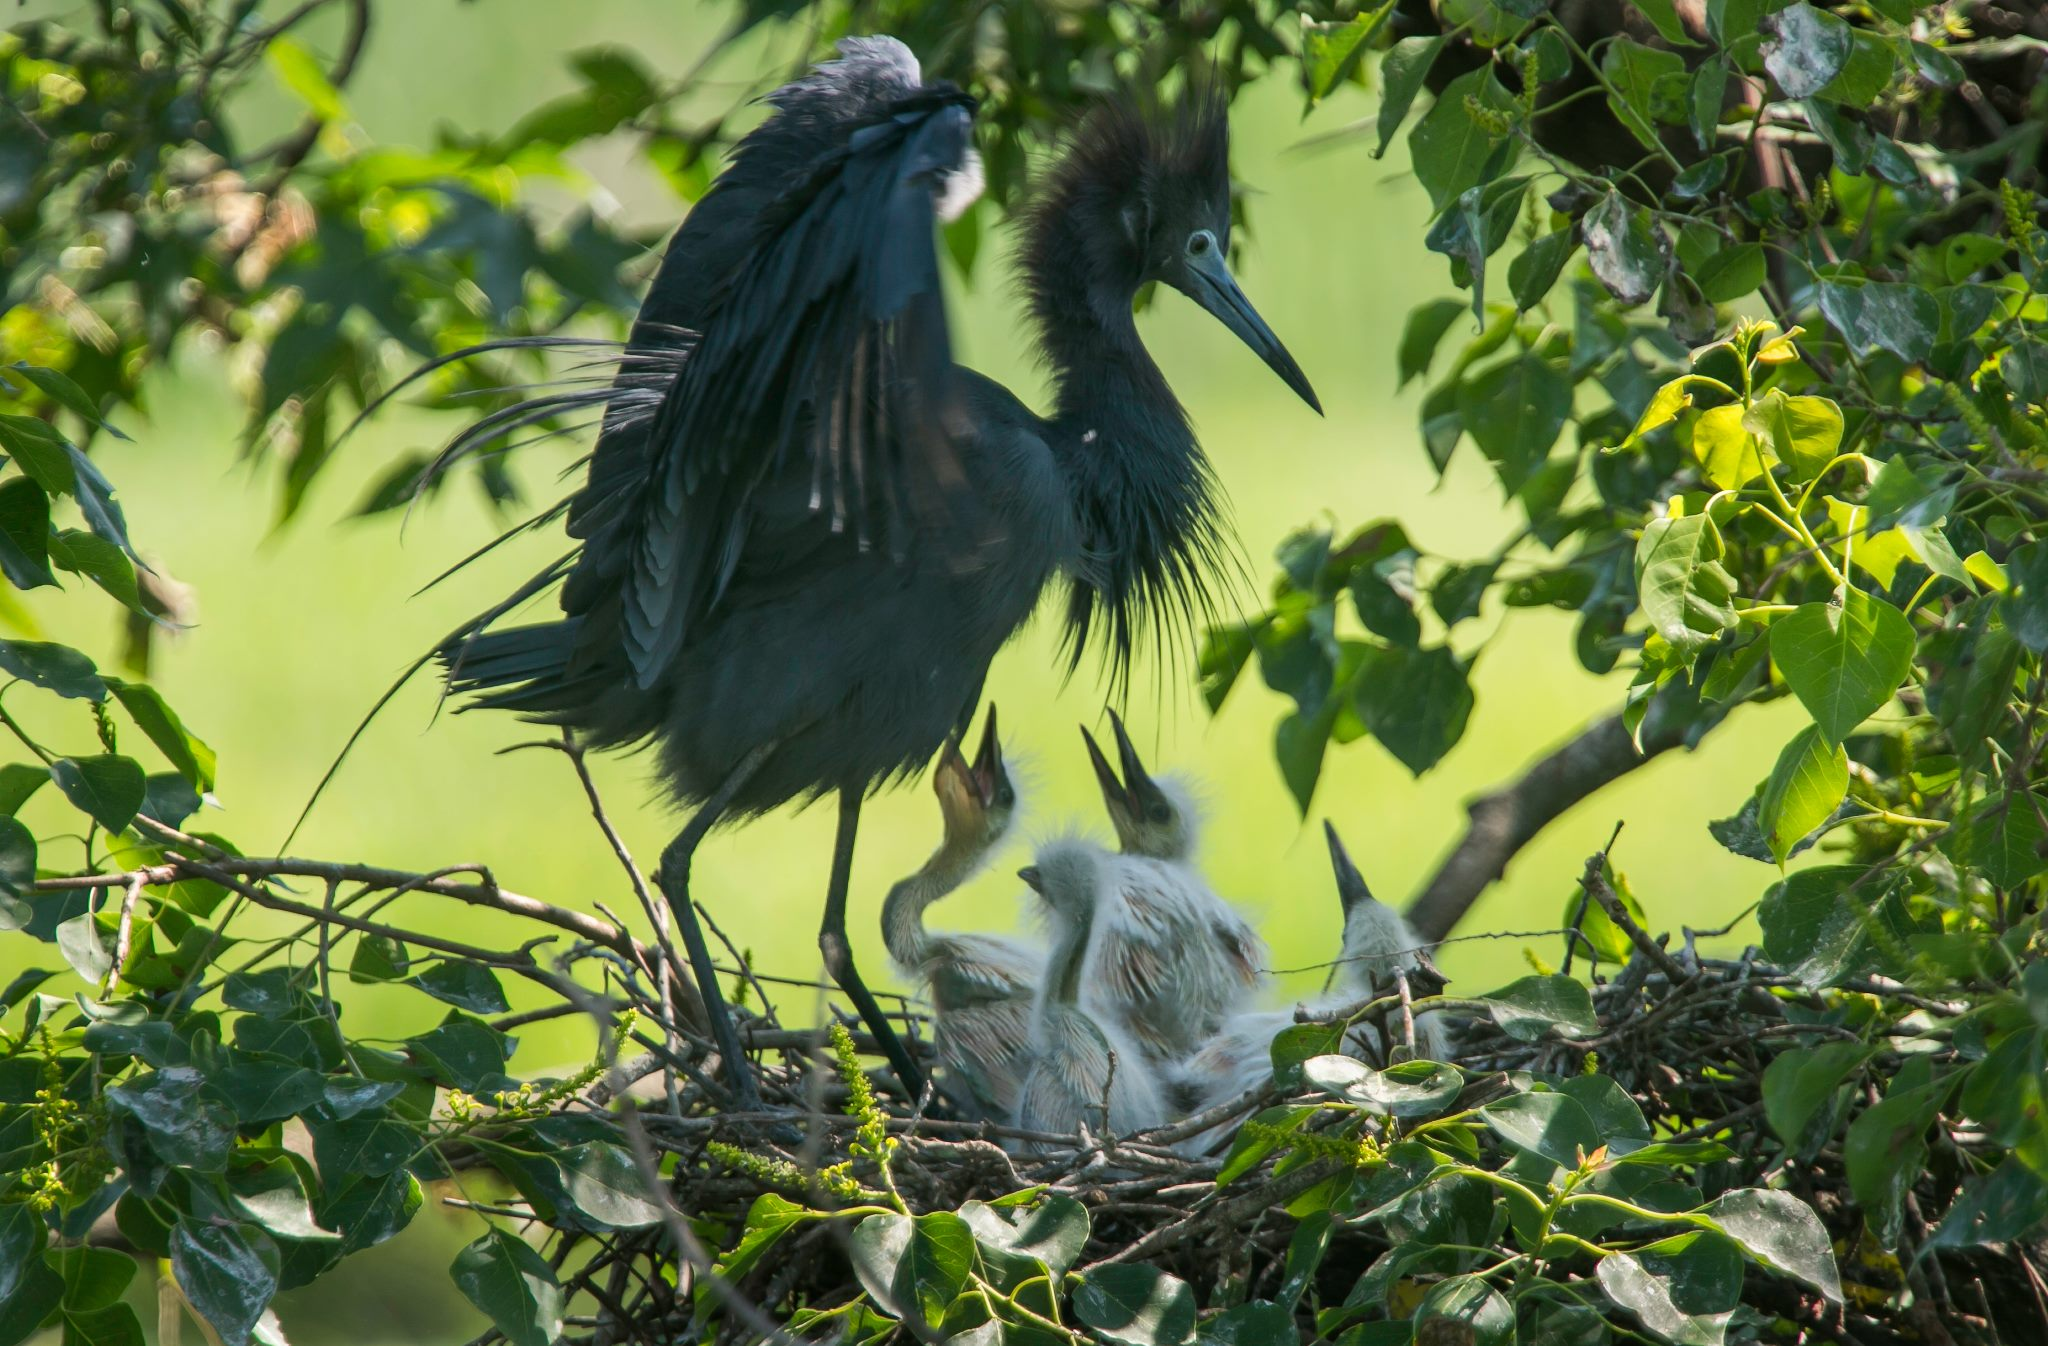 Gulf Coast birds get $35 million in help from BP oil spill settlement